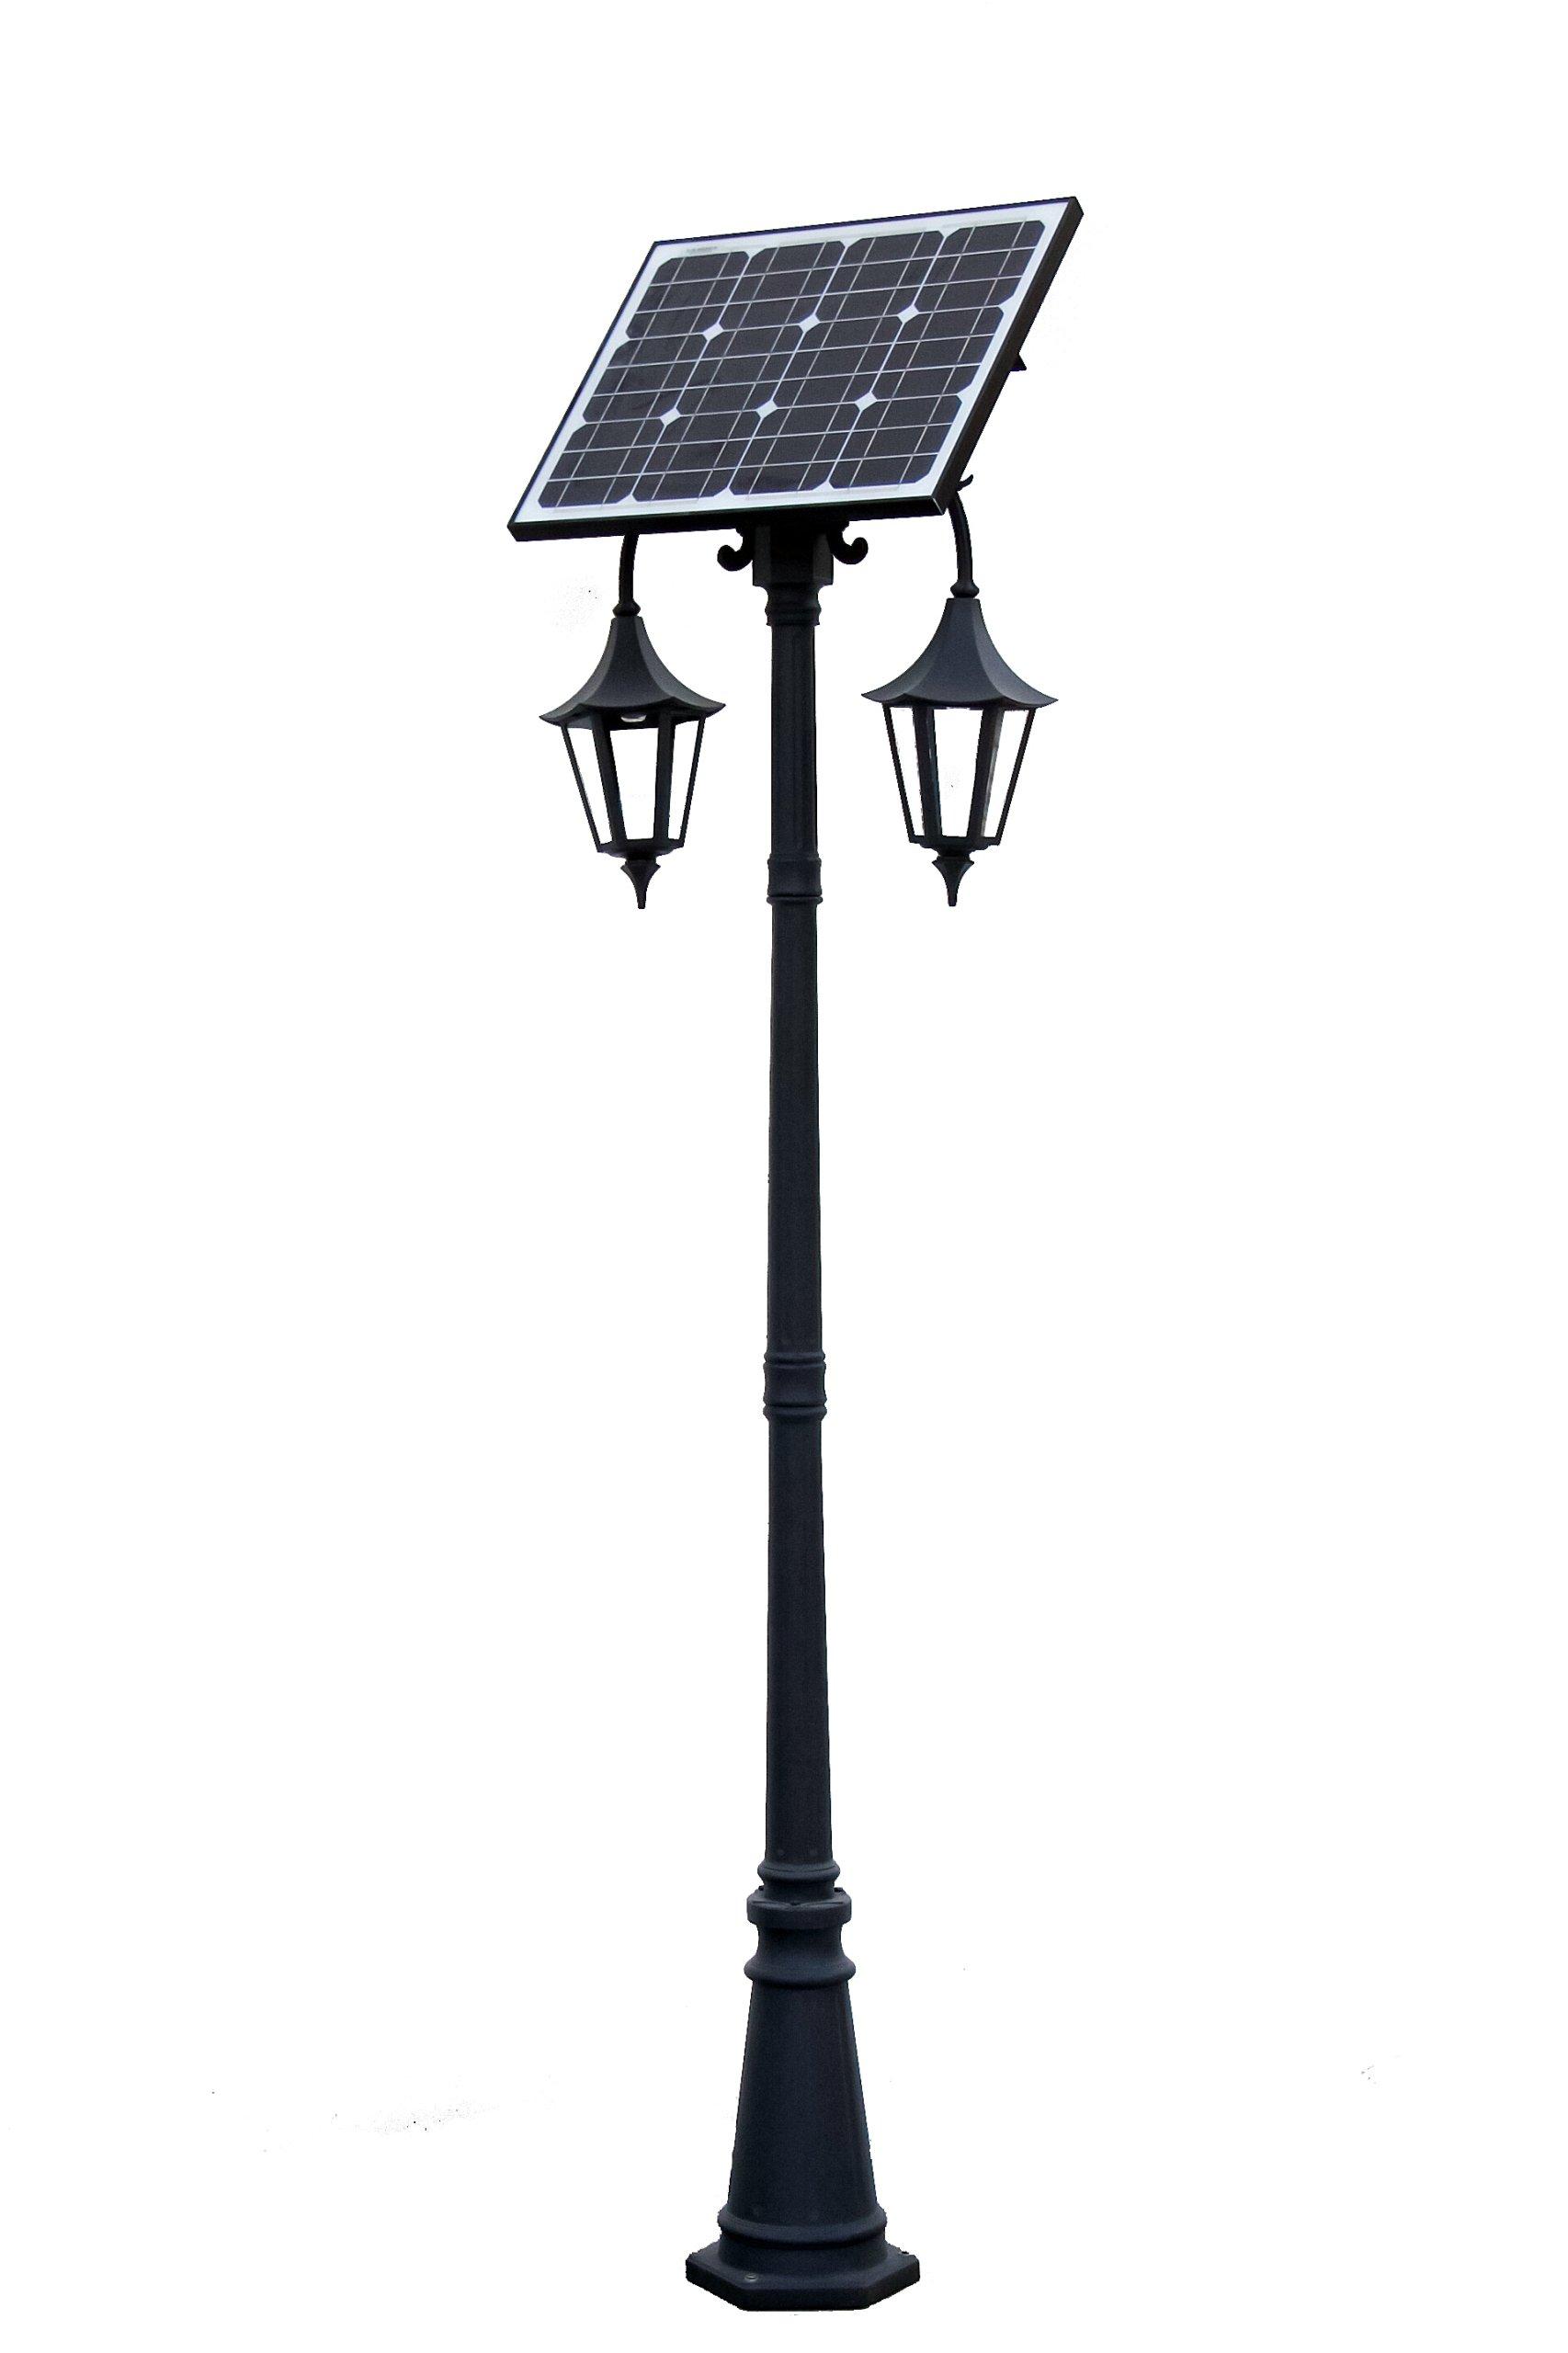 Lampy solárne svietidlo solárny Retro II 3m